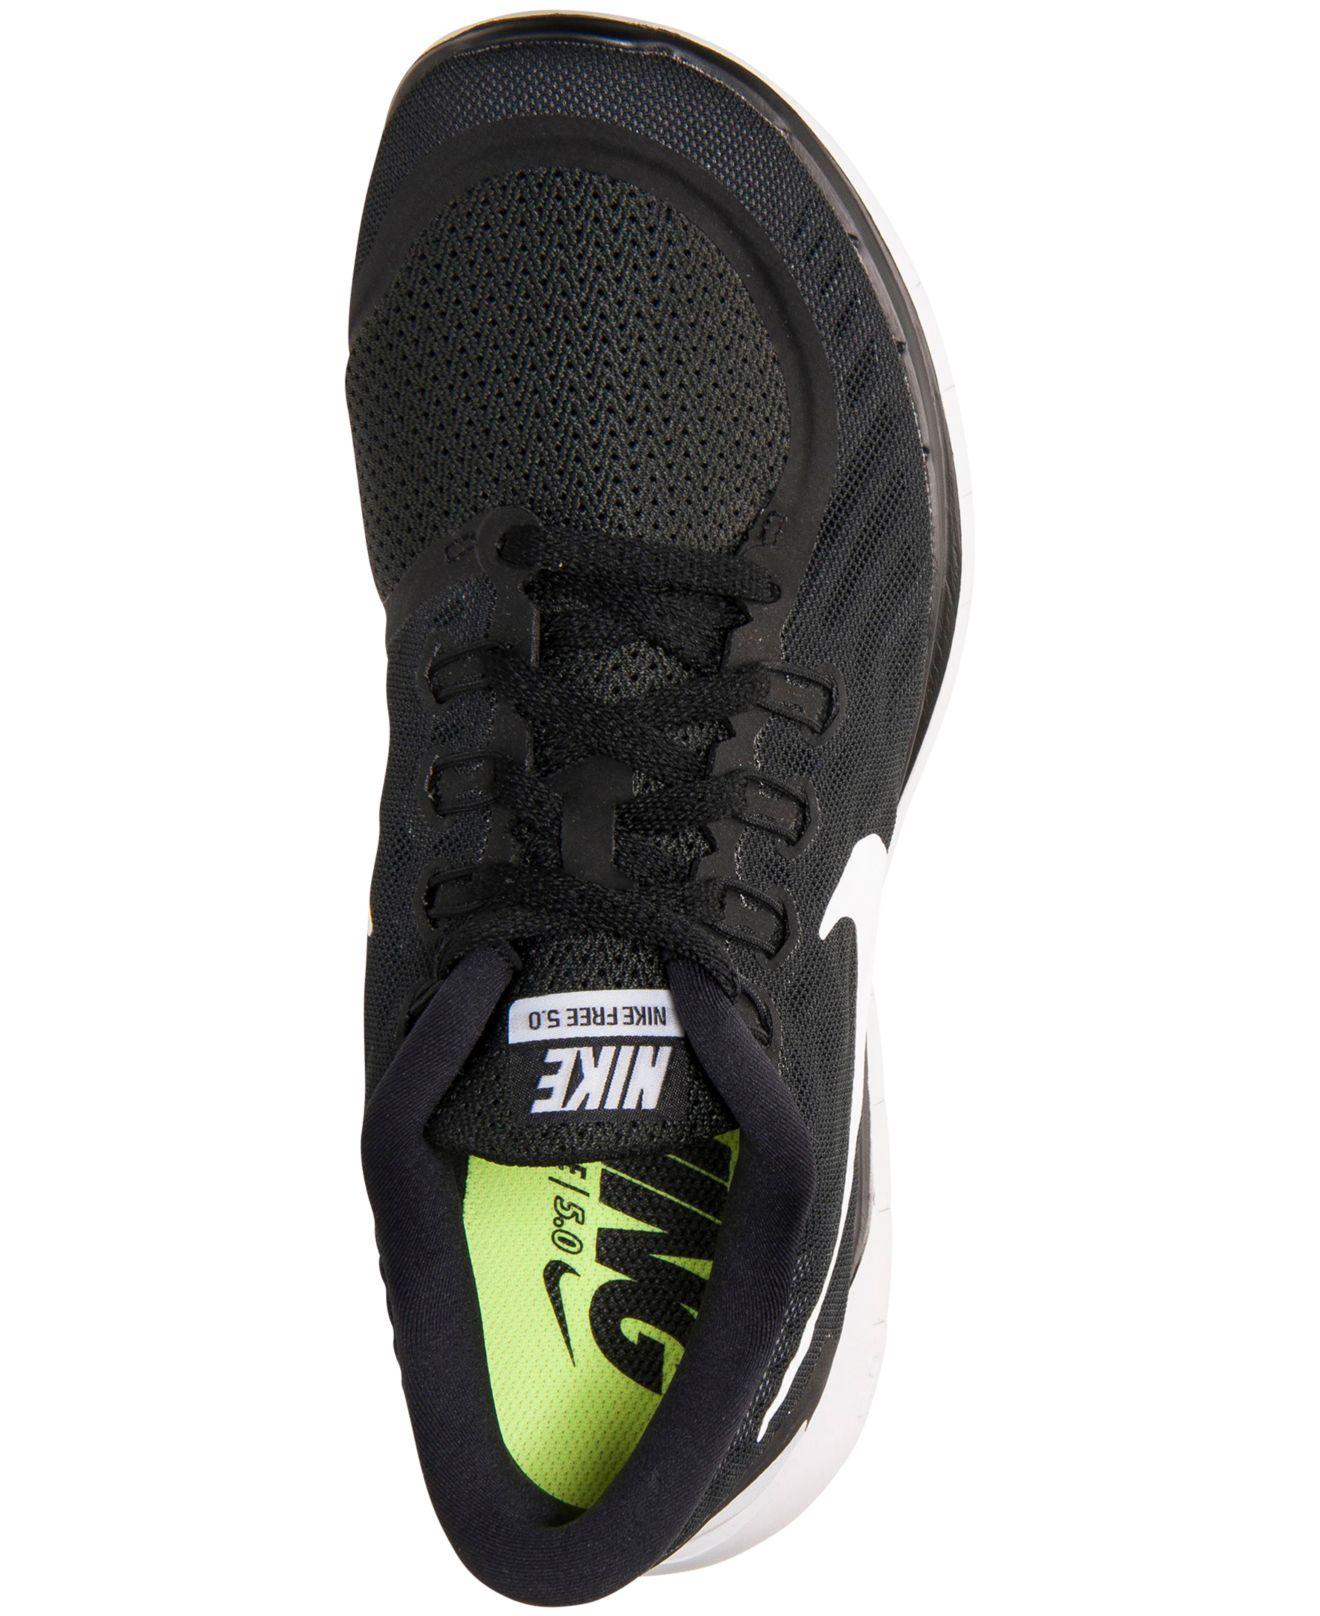 lyst nike women's free running scarpe dal traguardo in nero